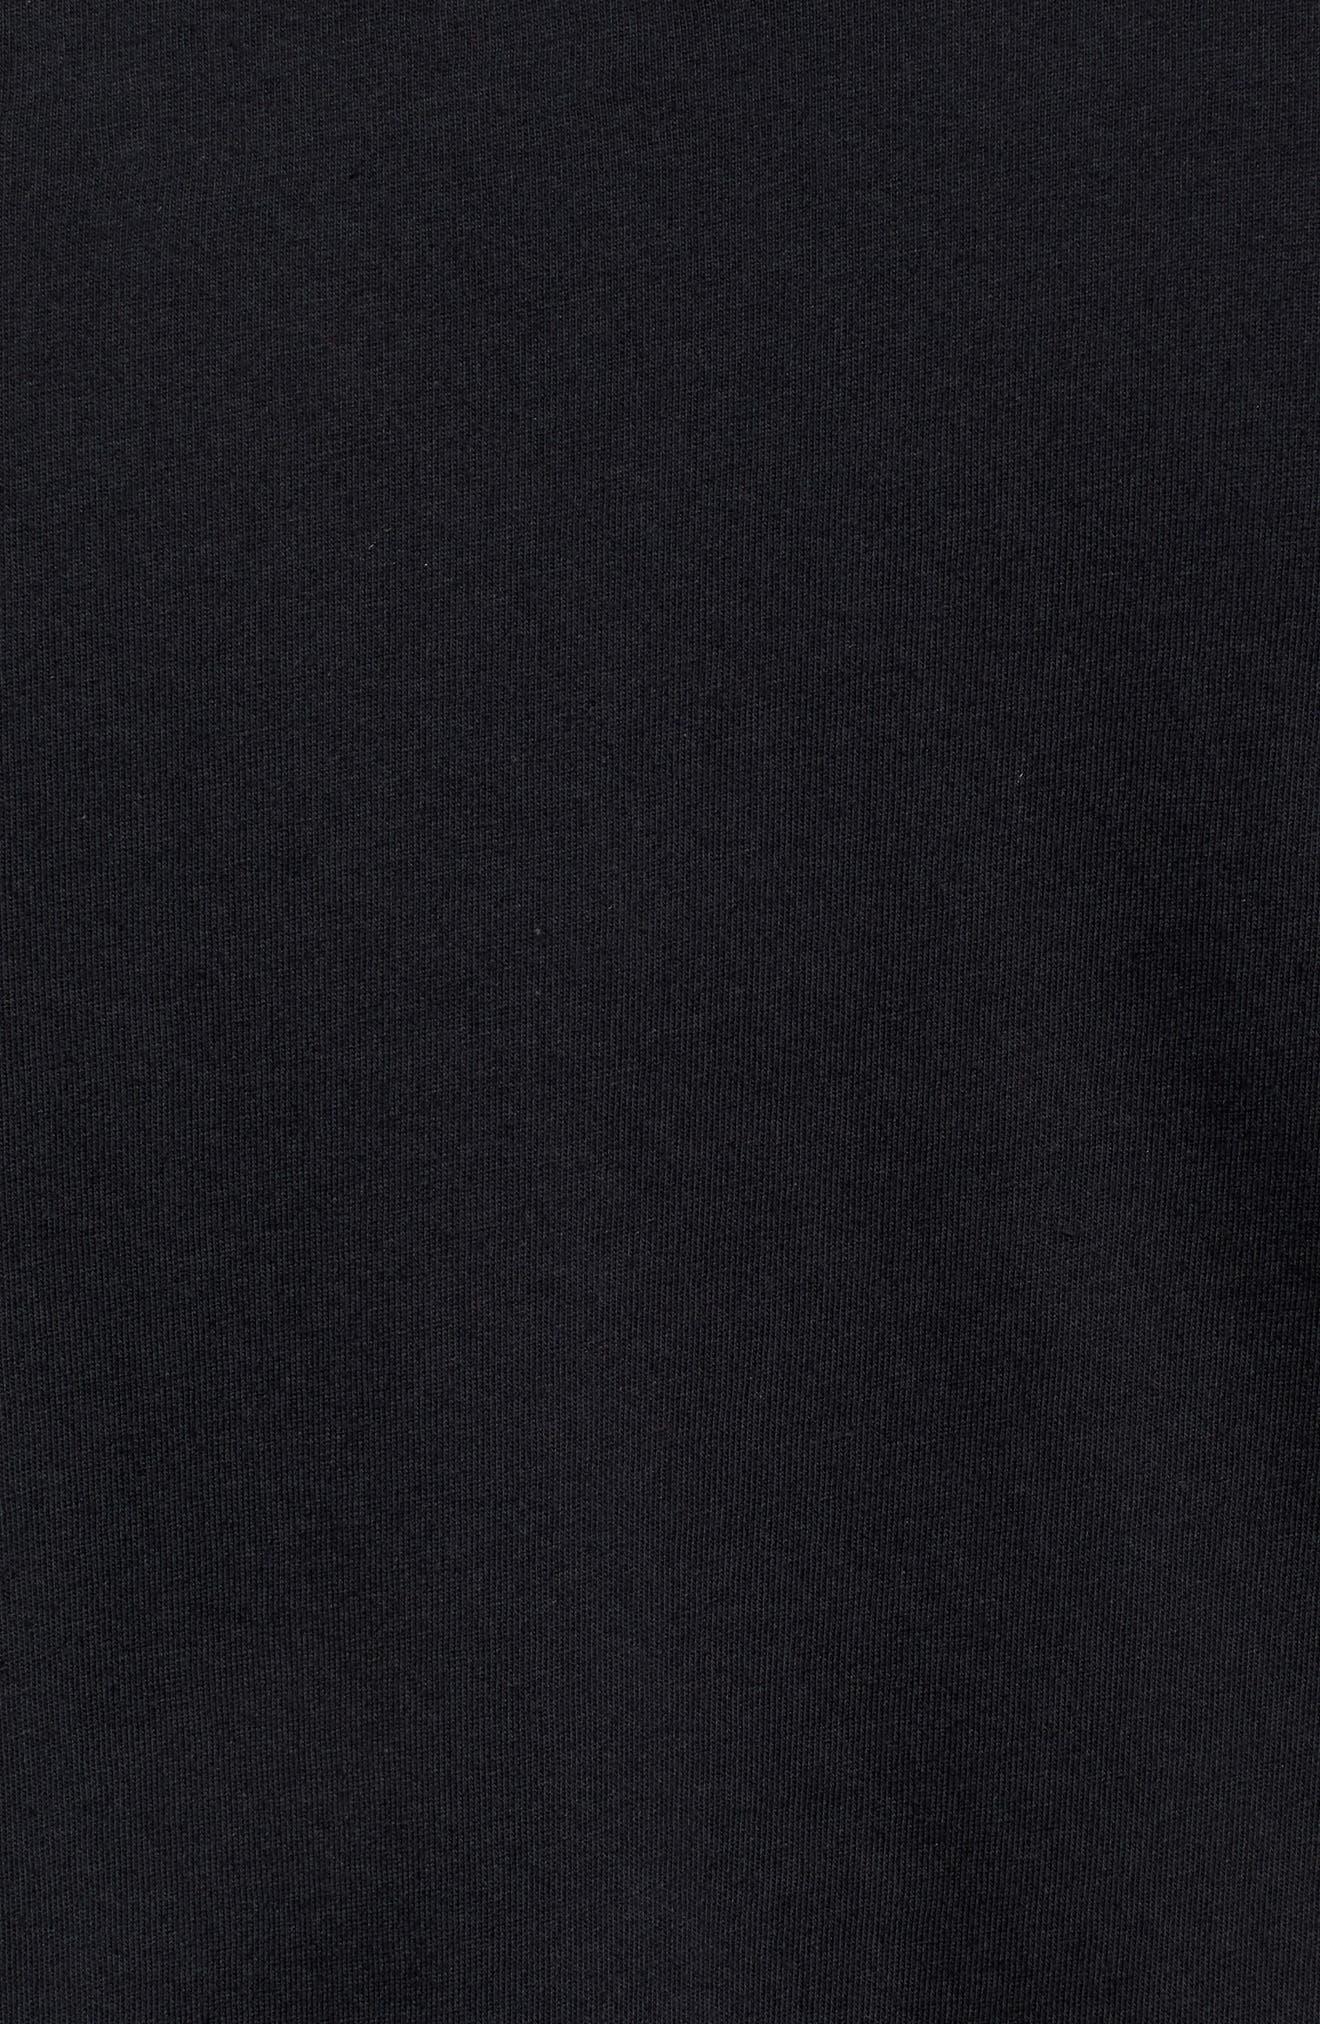 Tread Lightly Long Sleeve T-Shirt,                             Alternate thumbnail 5, color,                             BLACK